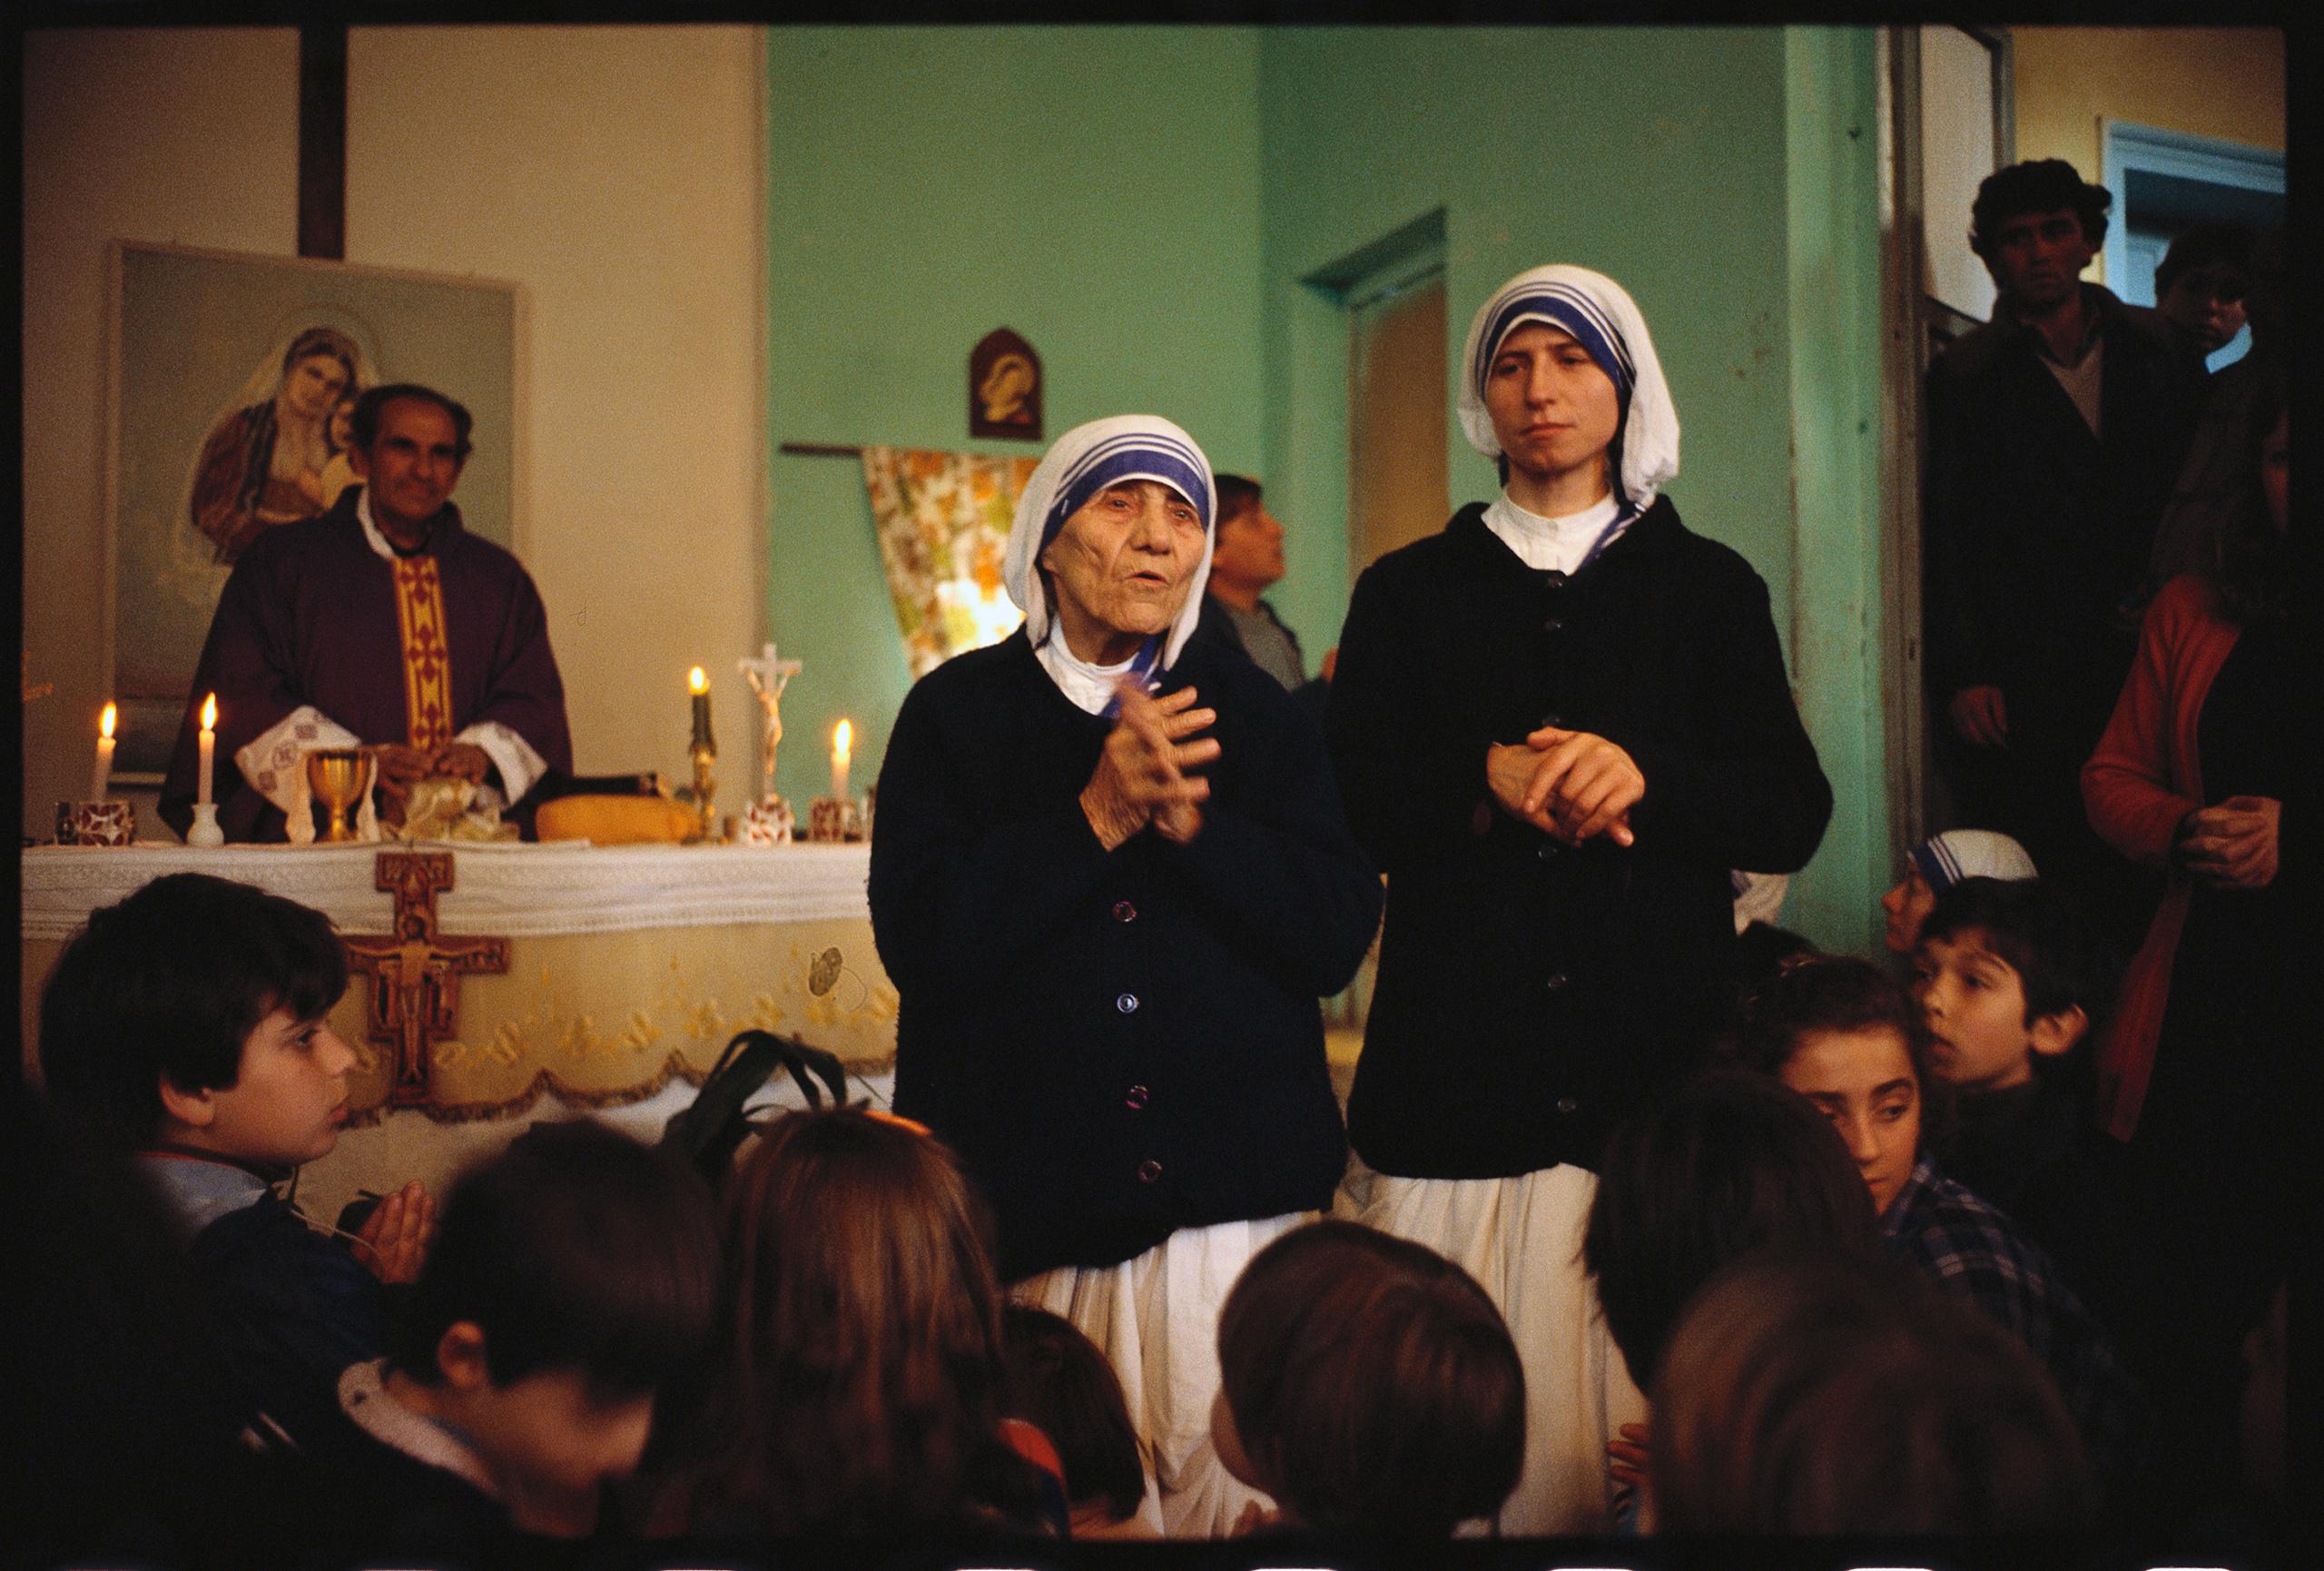 Mother Teresa addresses a group of children during mass at a church.